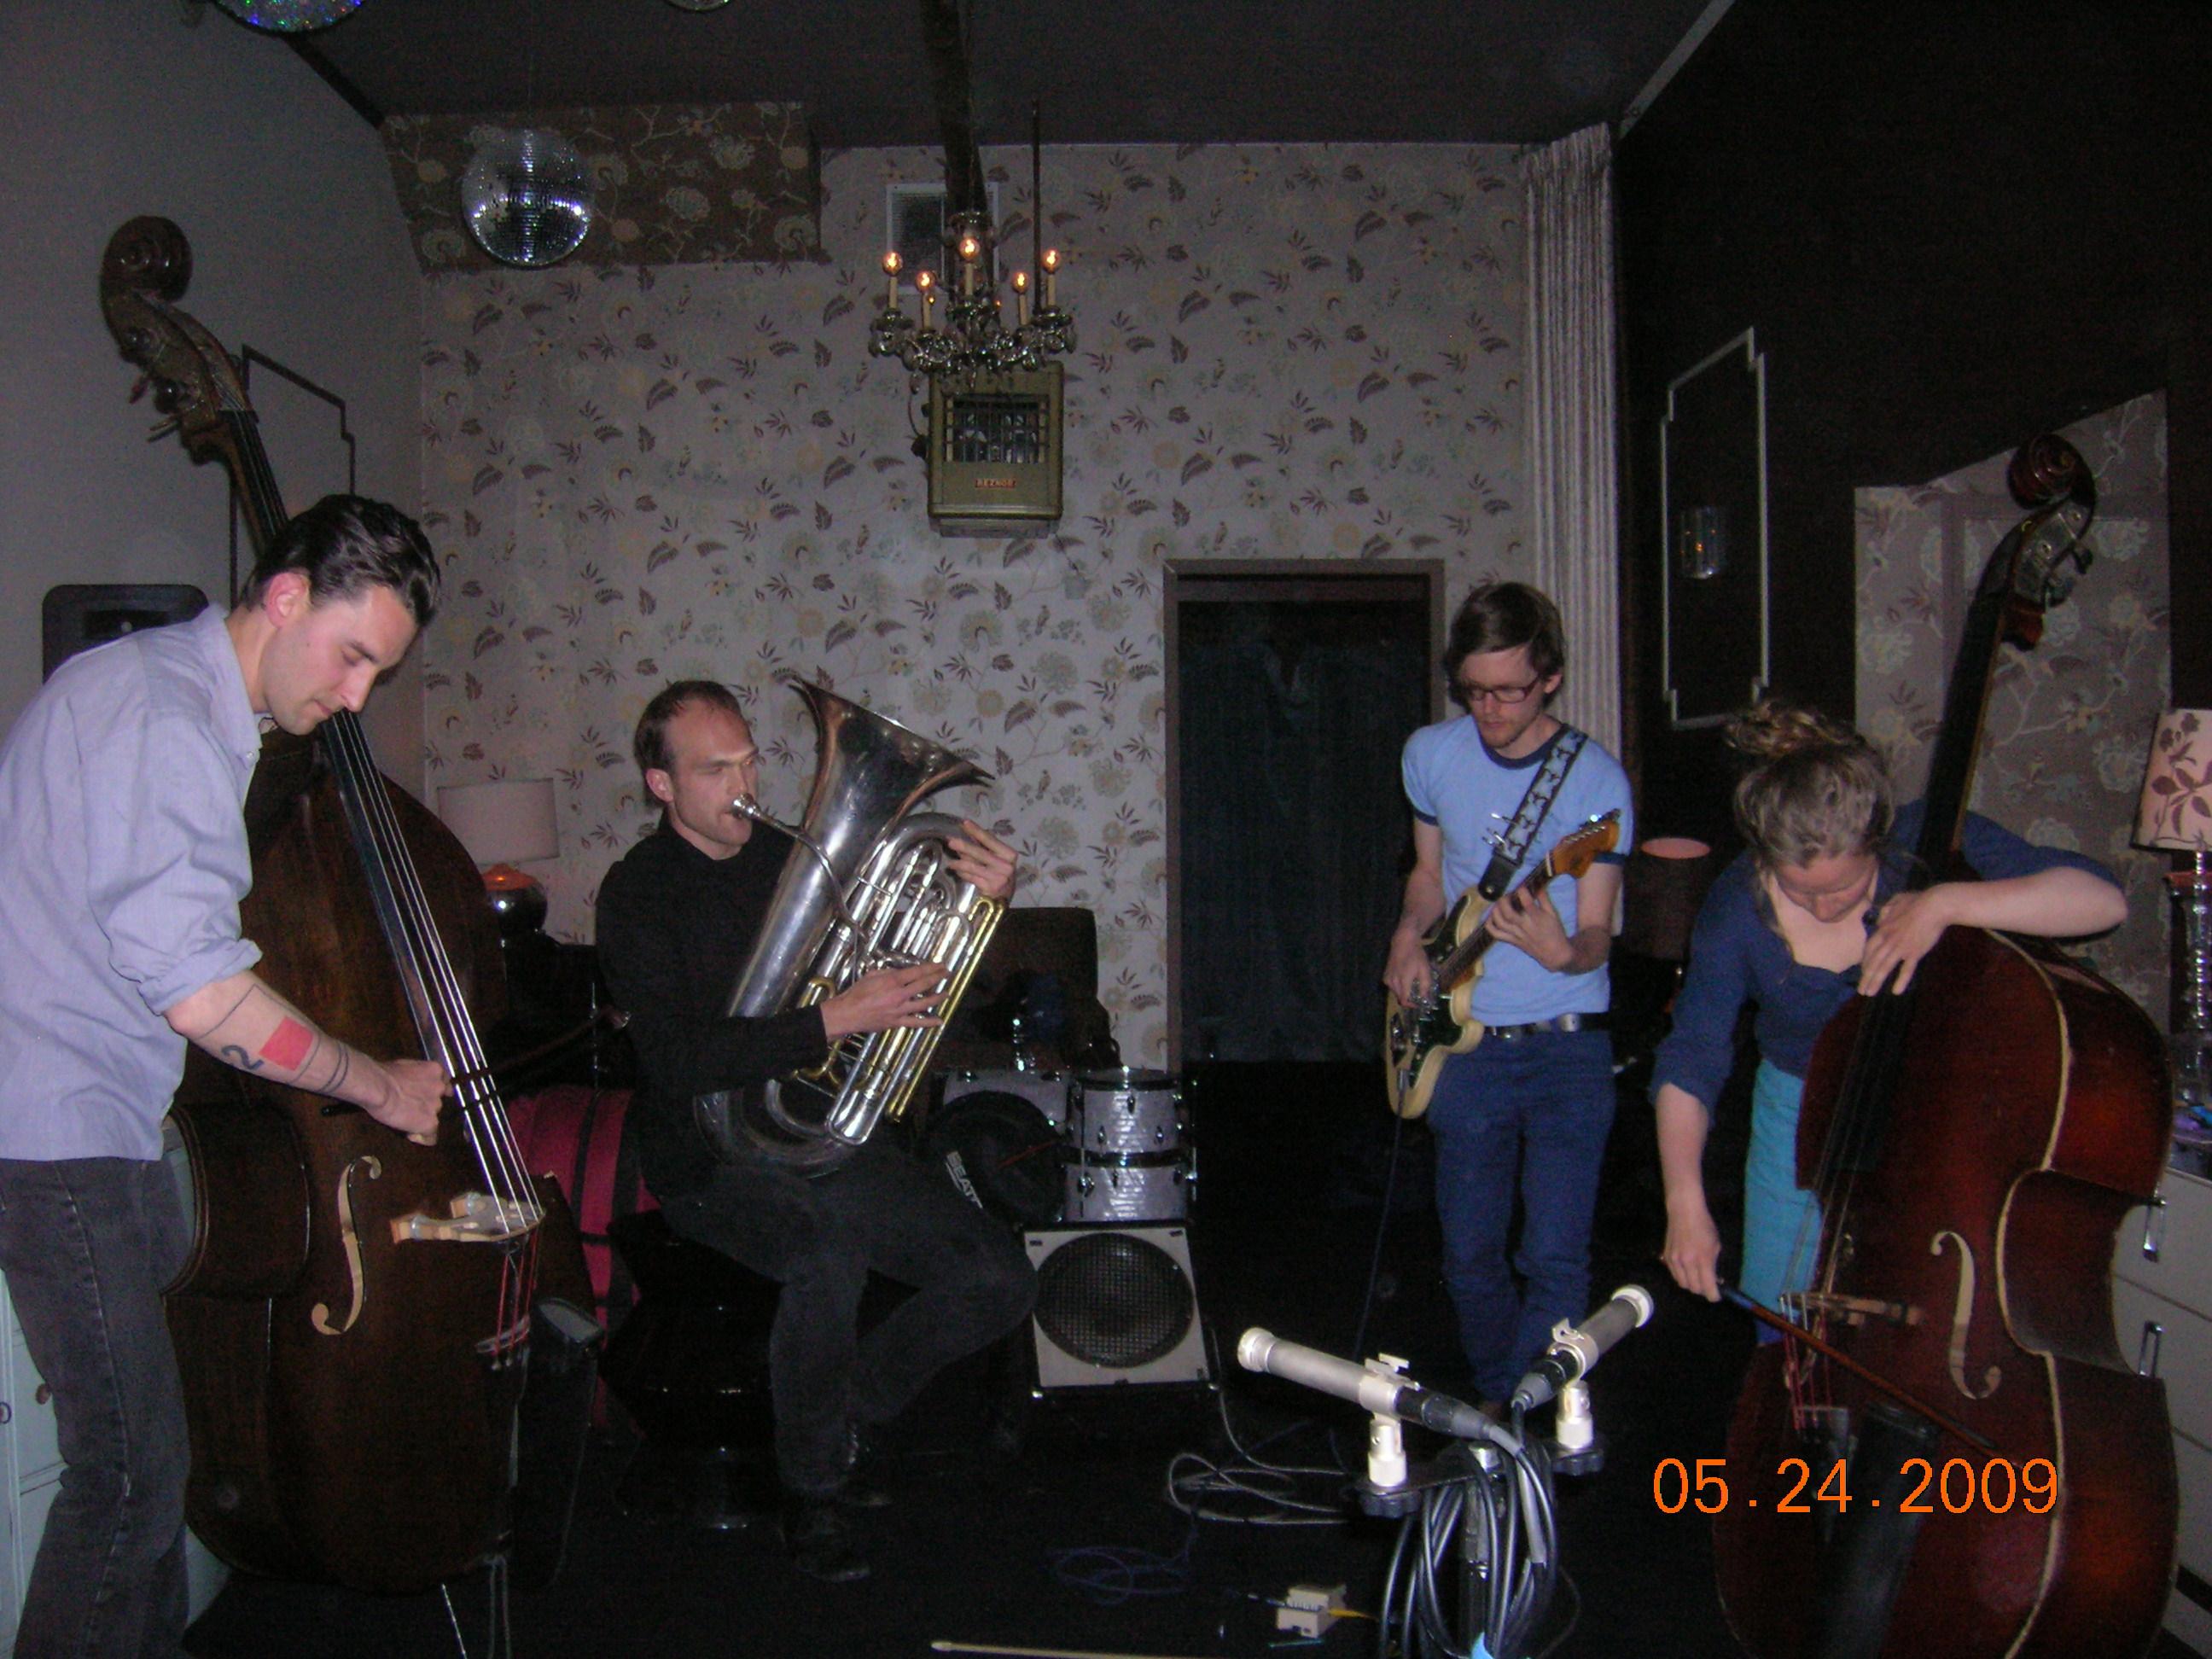 Ivy Room, May 2009